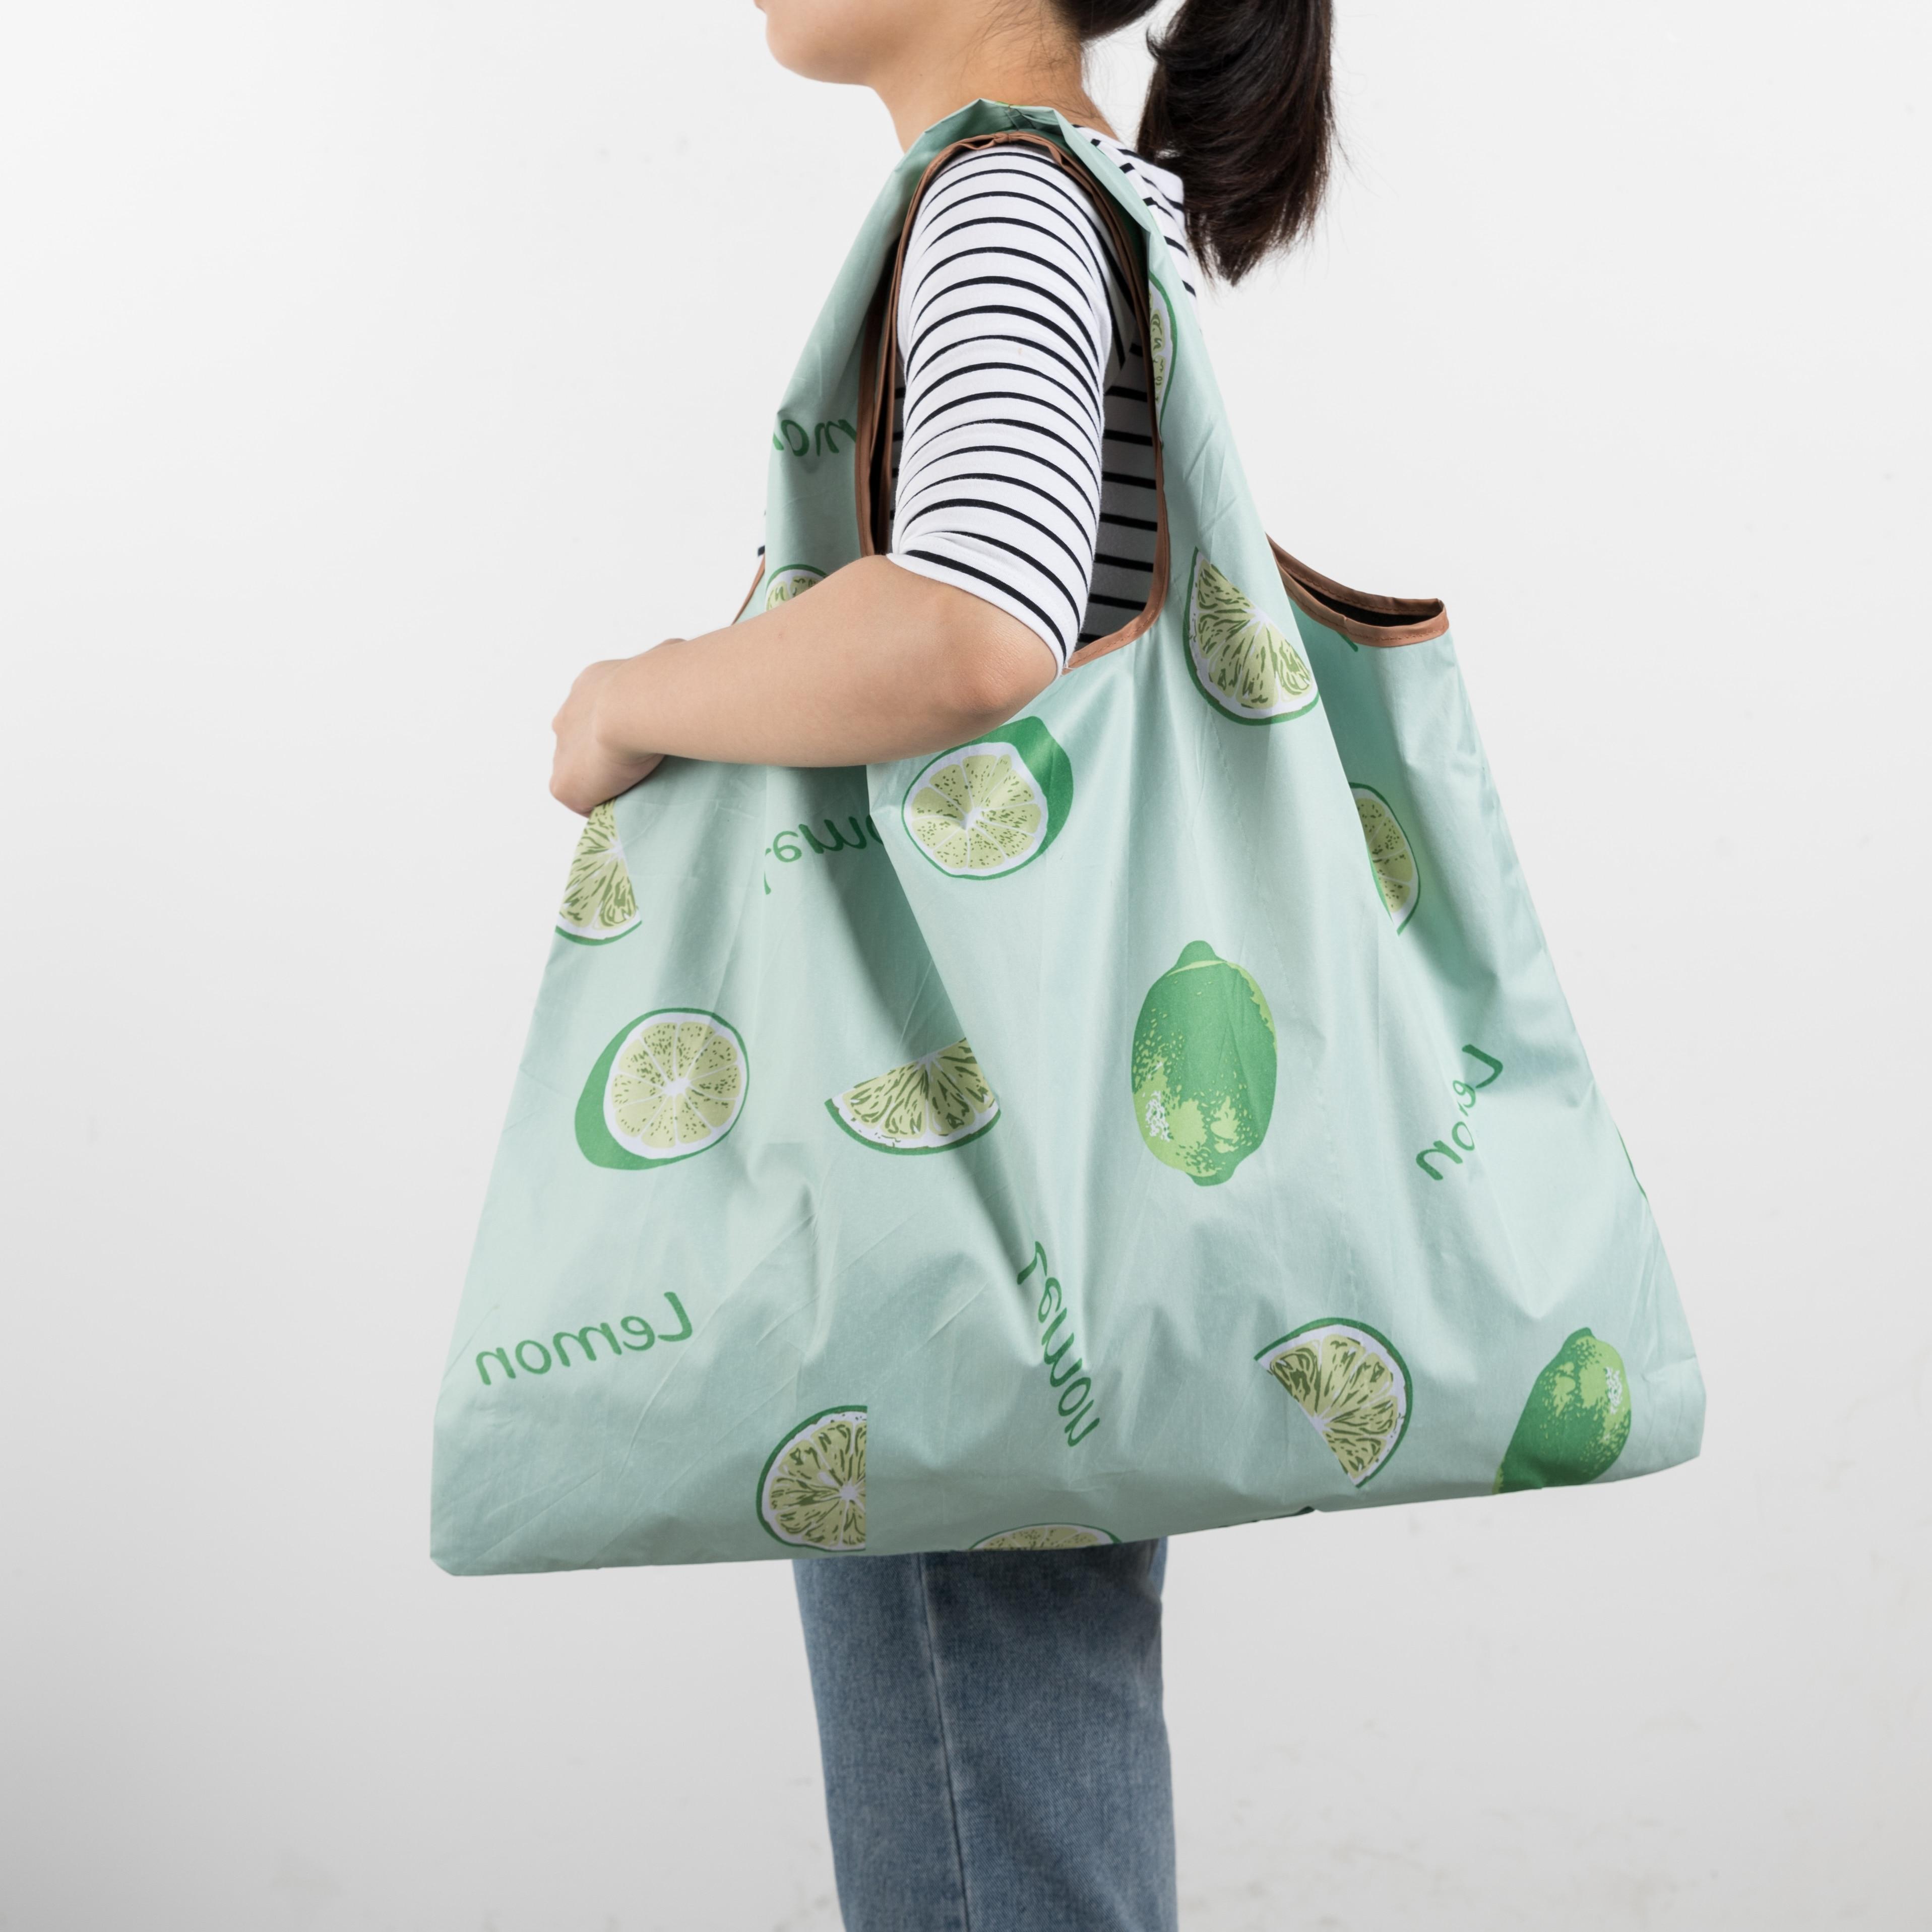 MABULA Eco friendly Cartoon Grocery Foldable Tote Handbag Reusable Portable two Size Washable Portable Travel Shopping Bags|Shopping Bags| - AliExpress